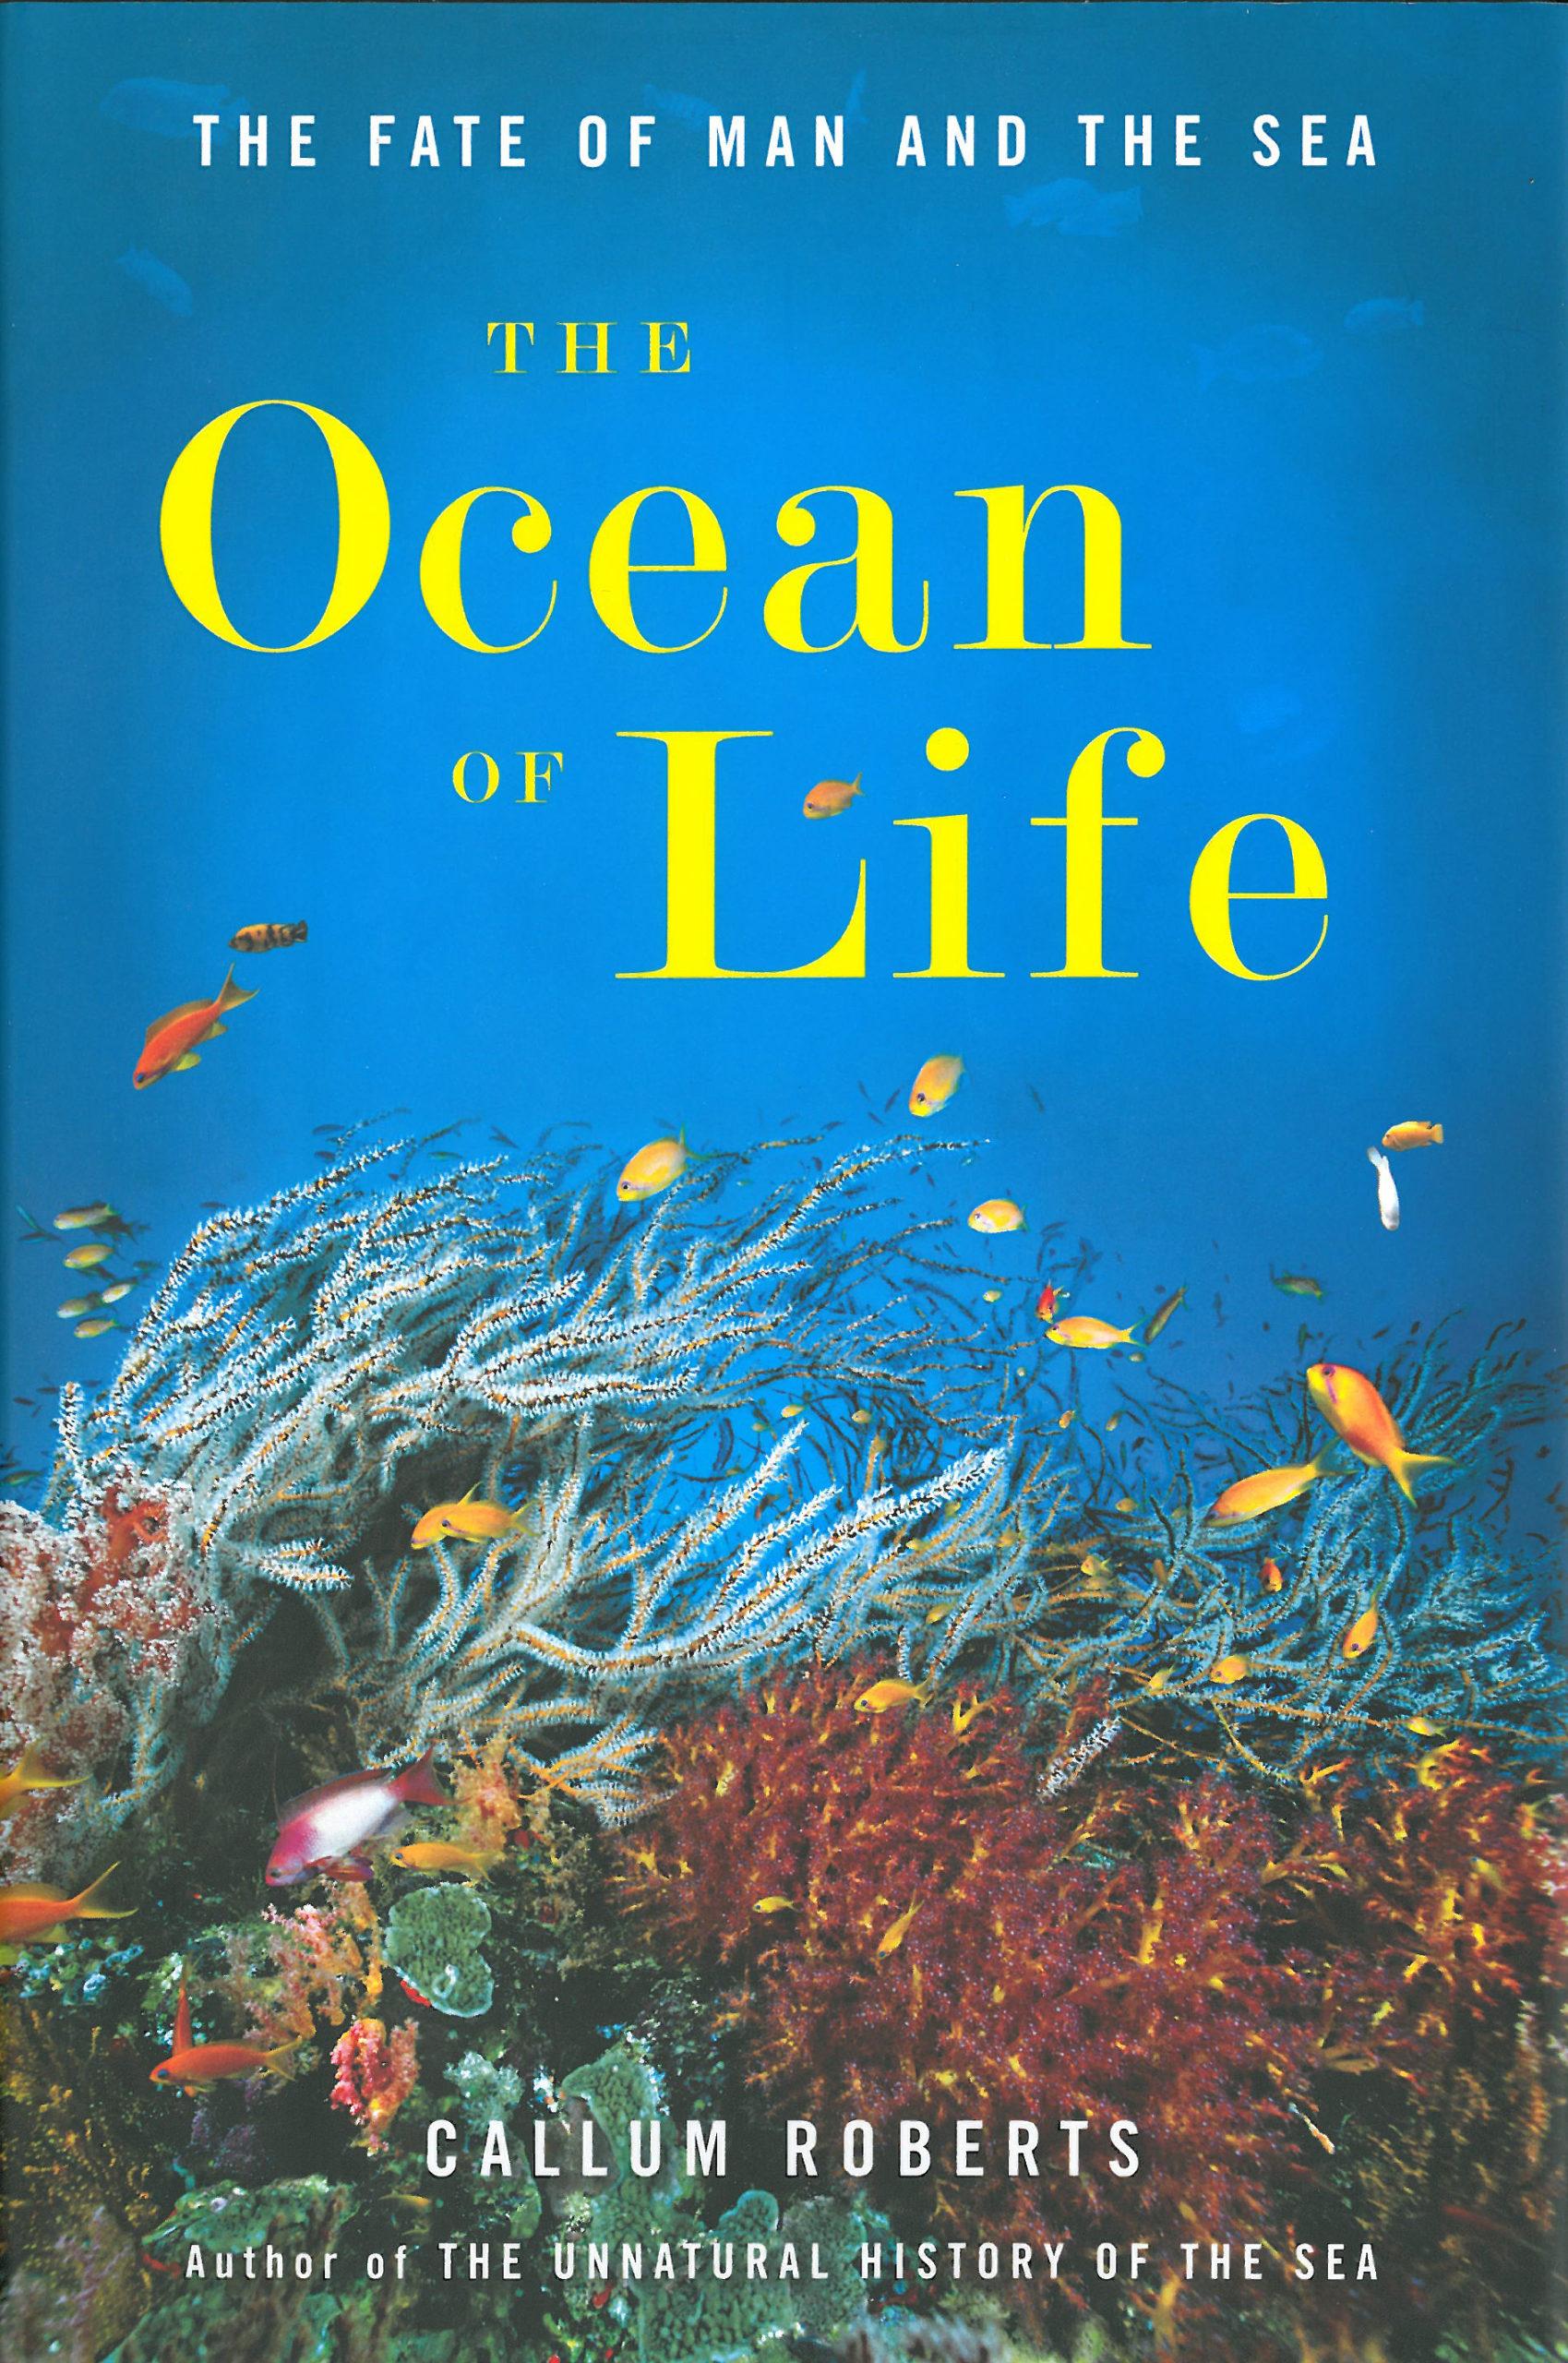 Callum Roberts: The Ocean of Life. Viking 2012, 406 s.